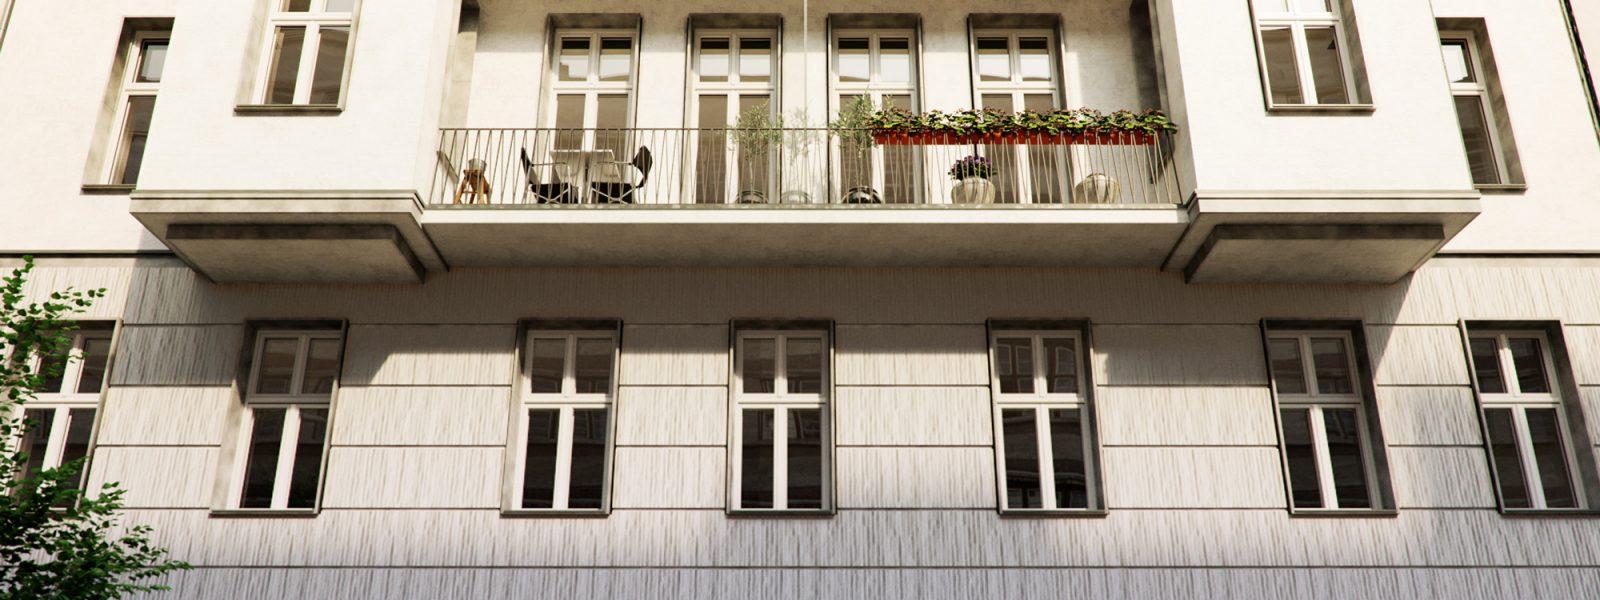 Квартира в старинном здании на Западе Берлина